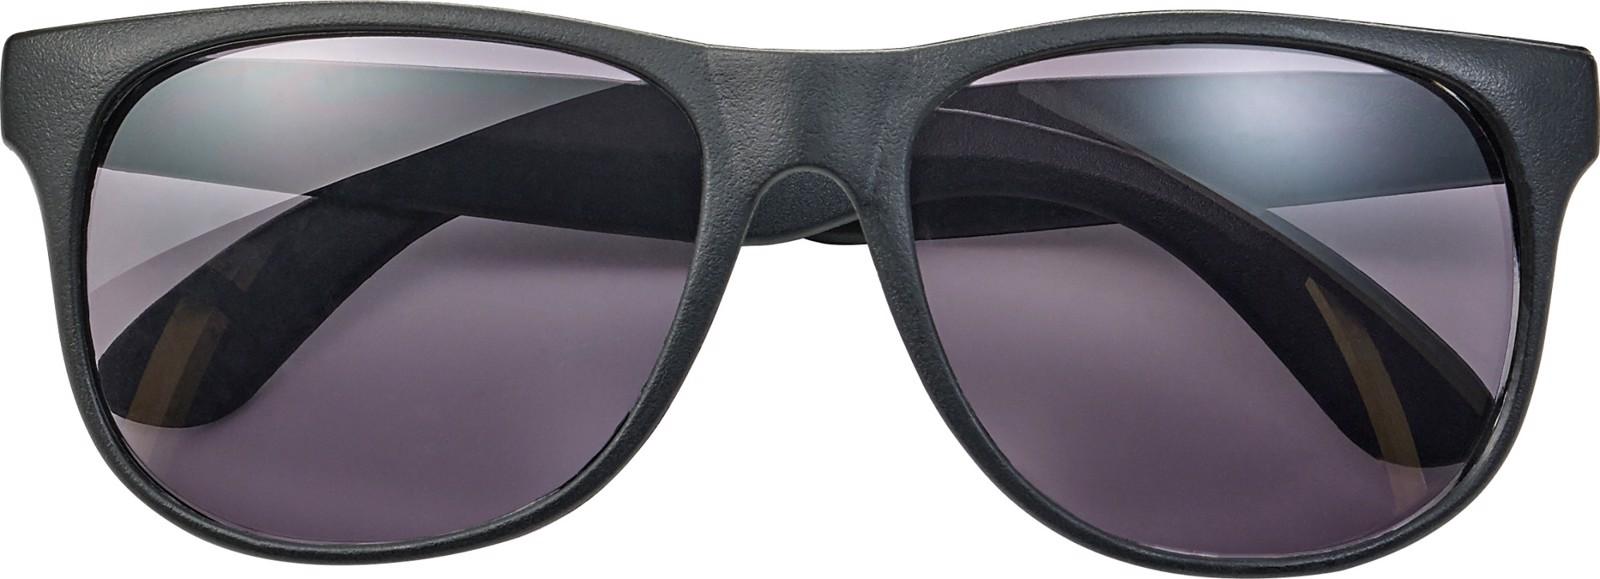 PP sunglasses - Black